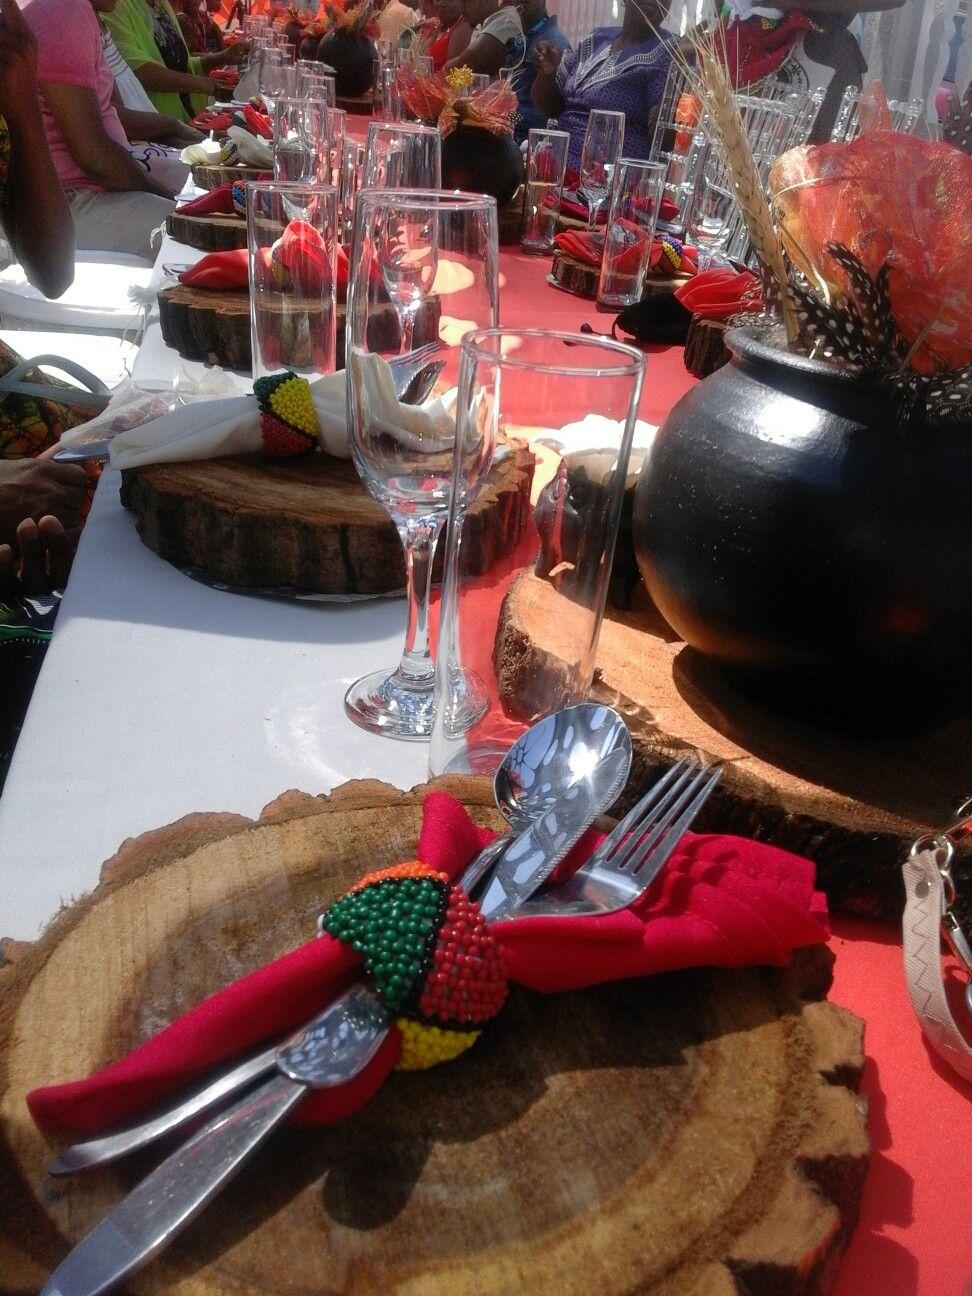 Yoruba traditional wedding decorations  Pin by Nomfuneko Mabulu on African deco  Pinterest  Traditional